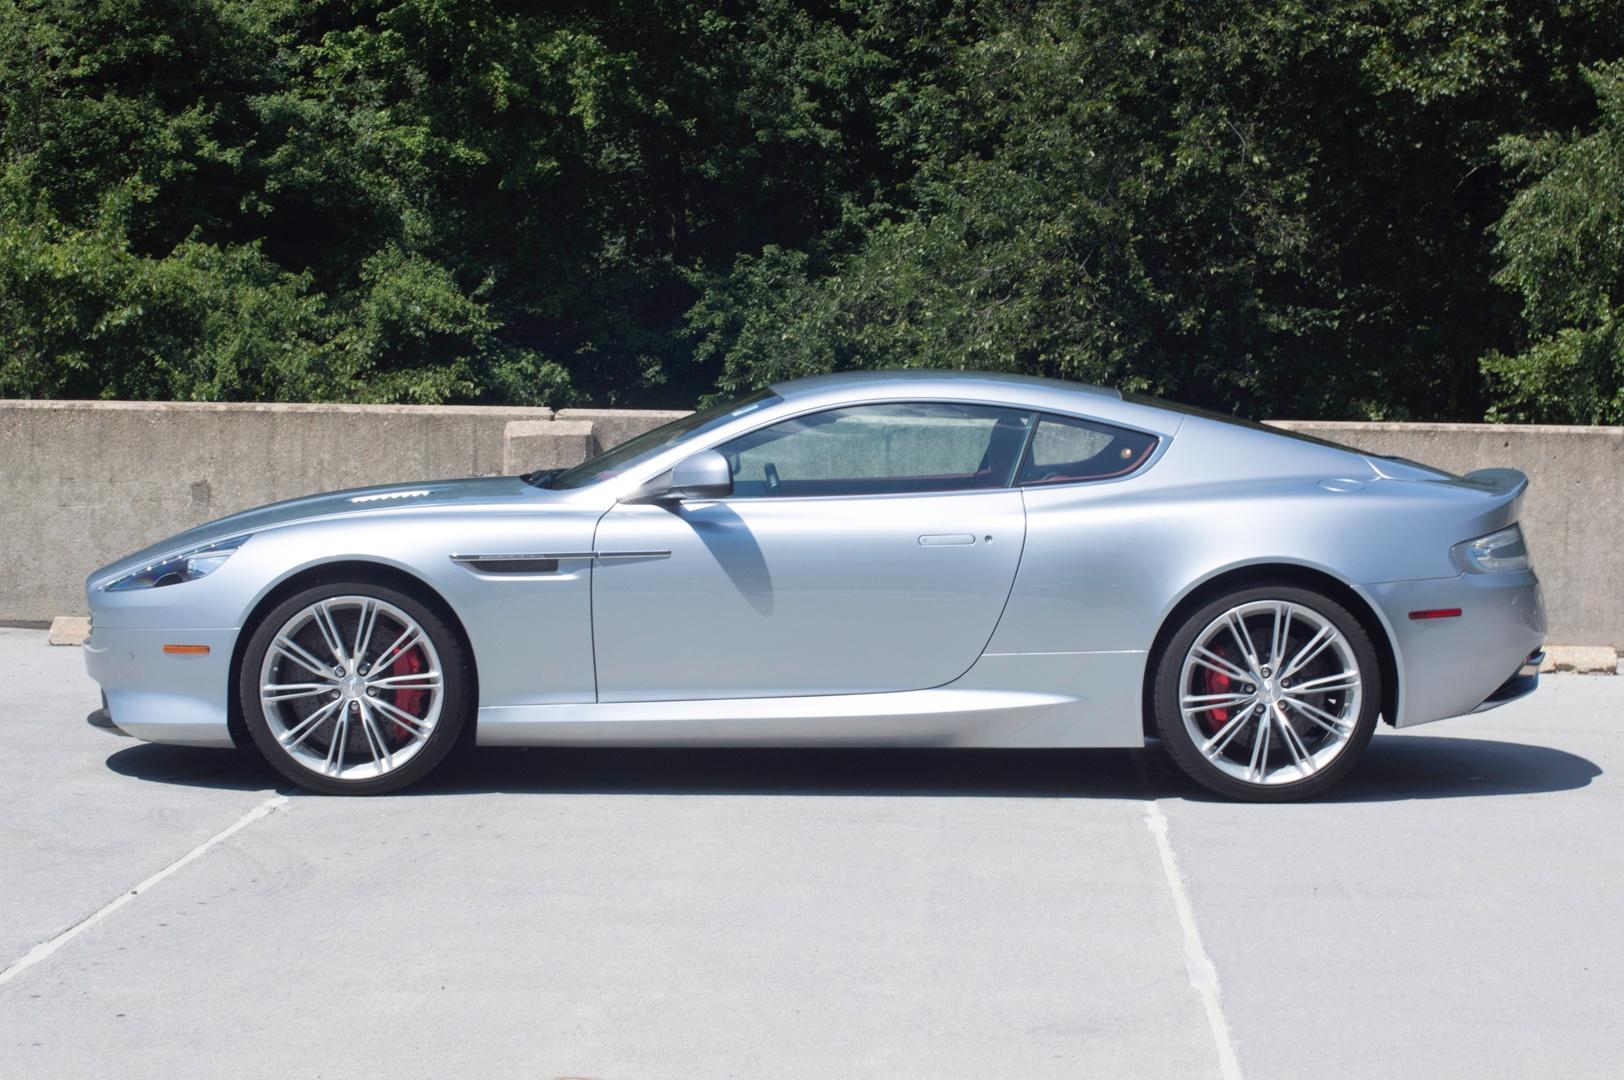 2013 Aston Martin Db9 Stock 3na14750 For Sale Near Vienna Va Va